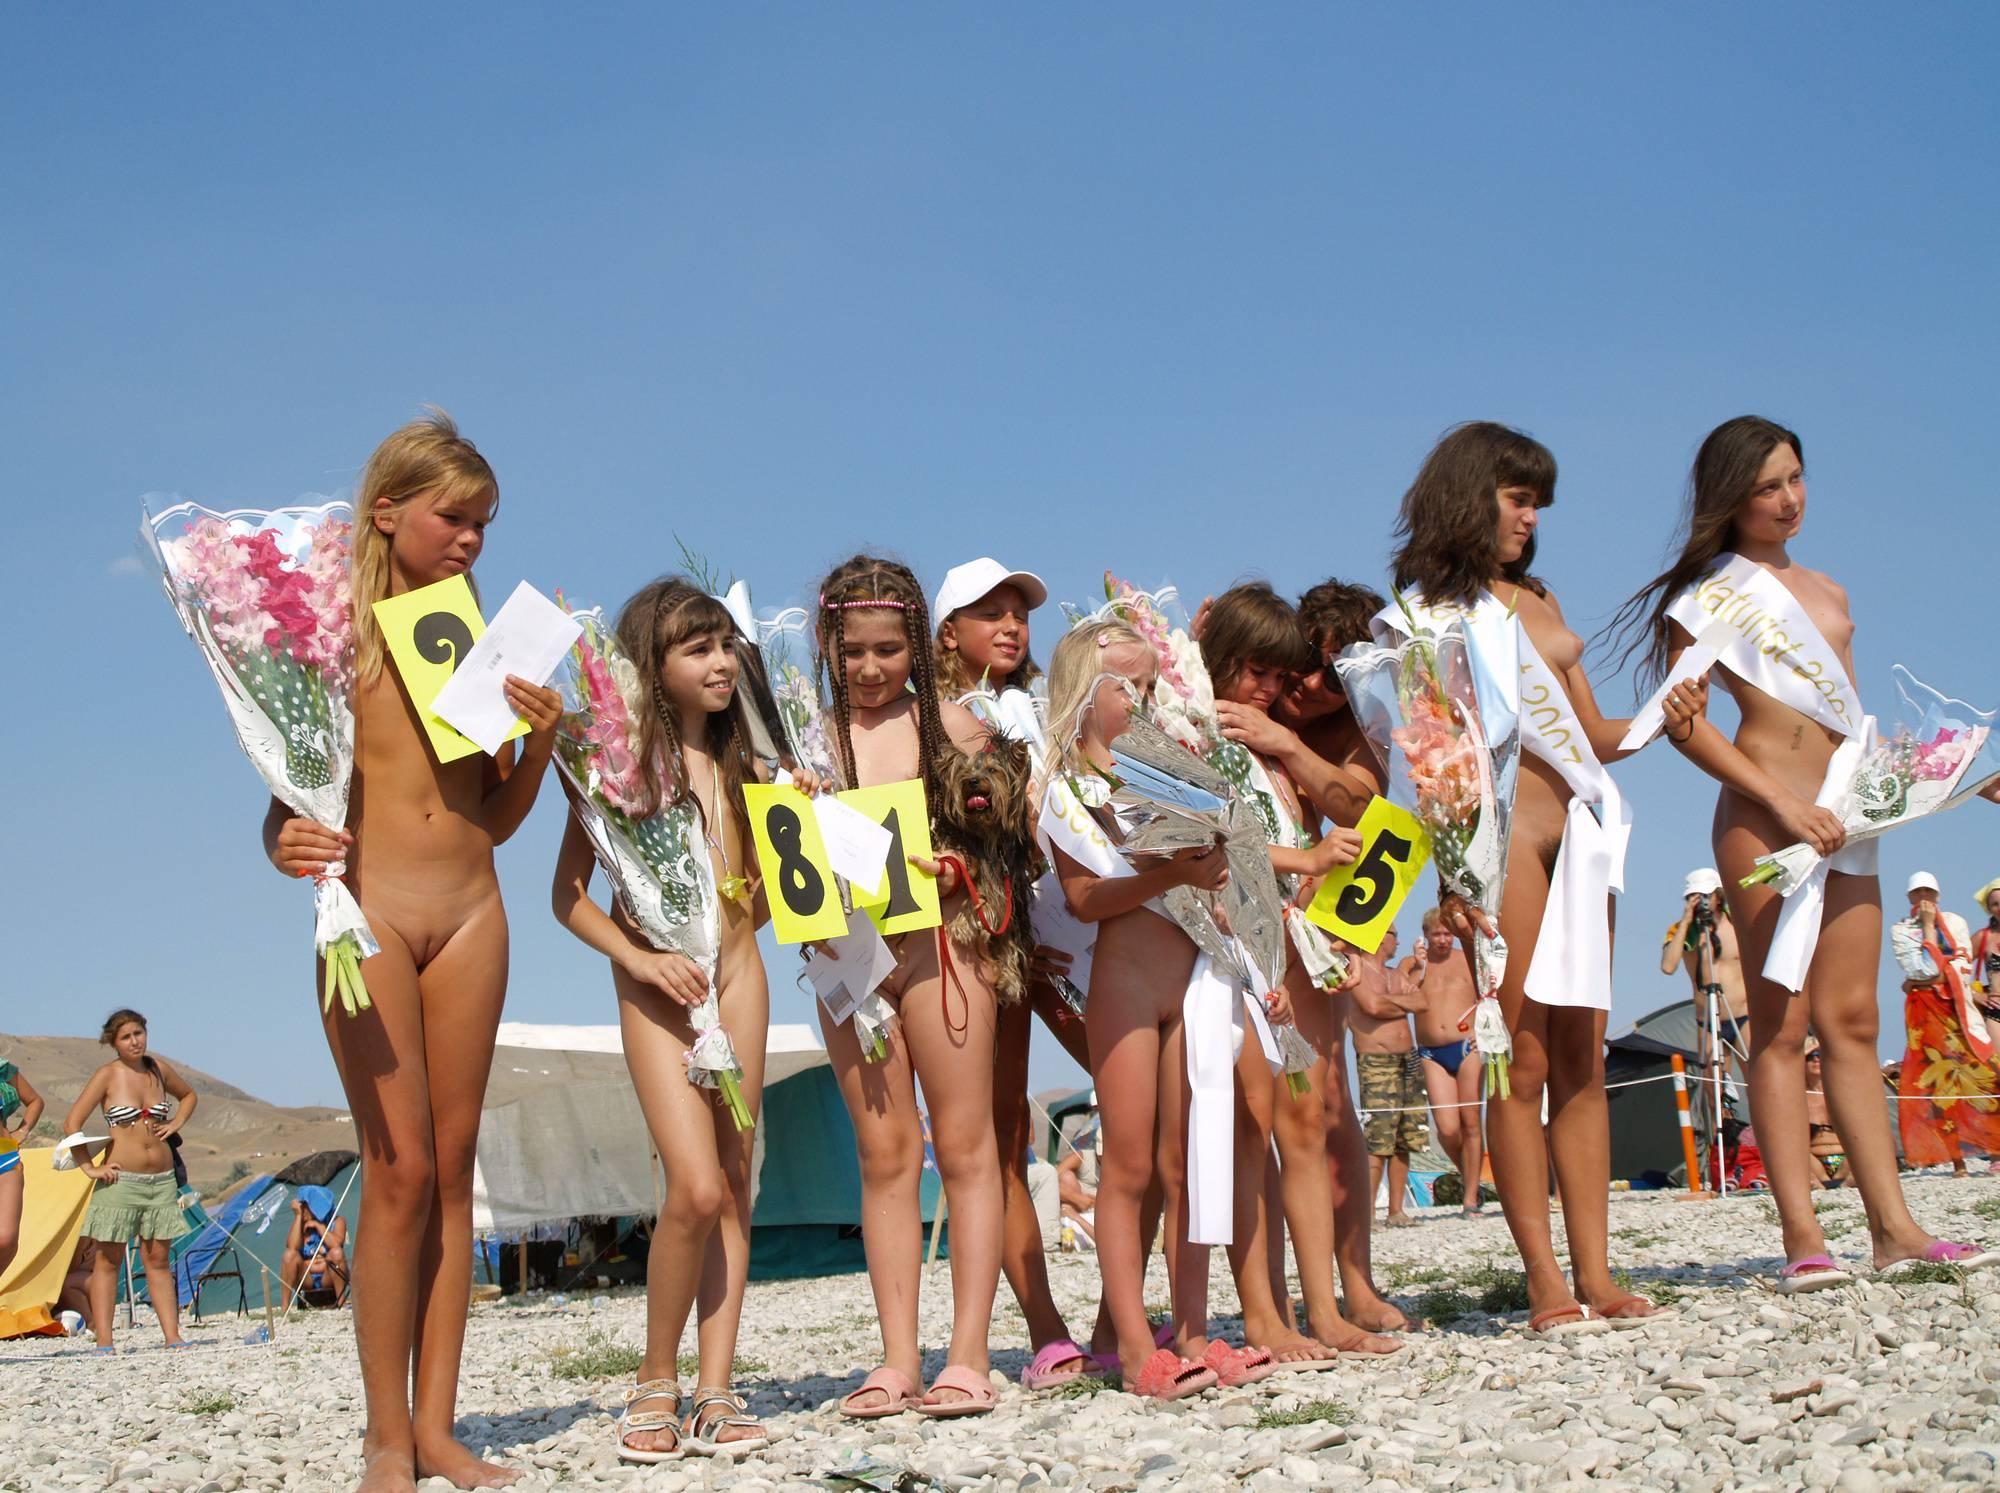 Nudist Pics Nude Jr Kids Pageant - 2